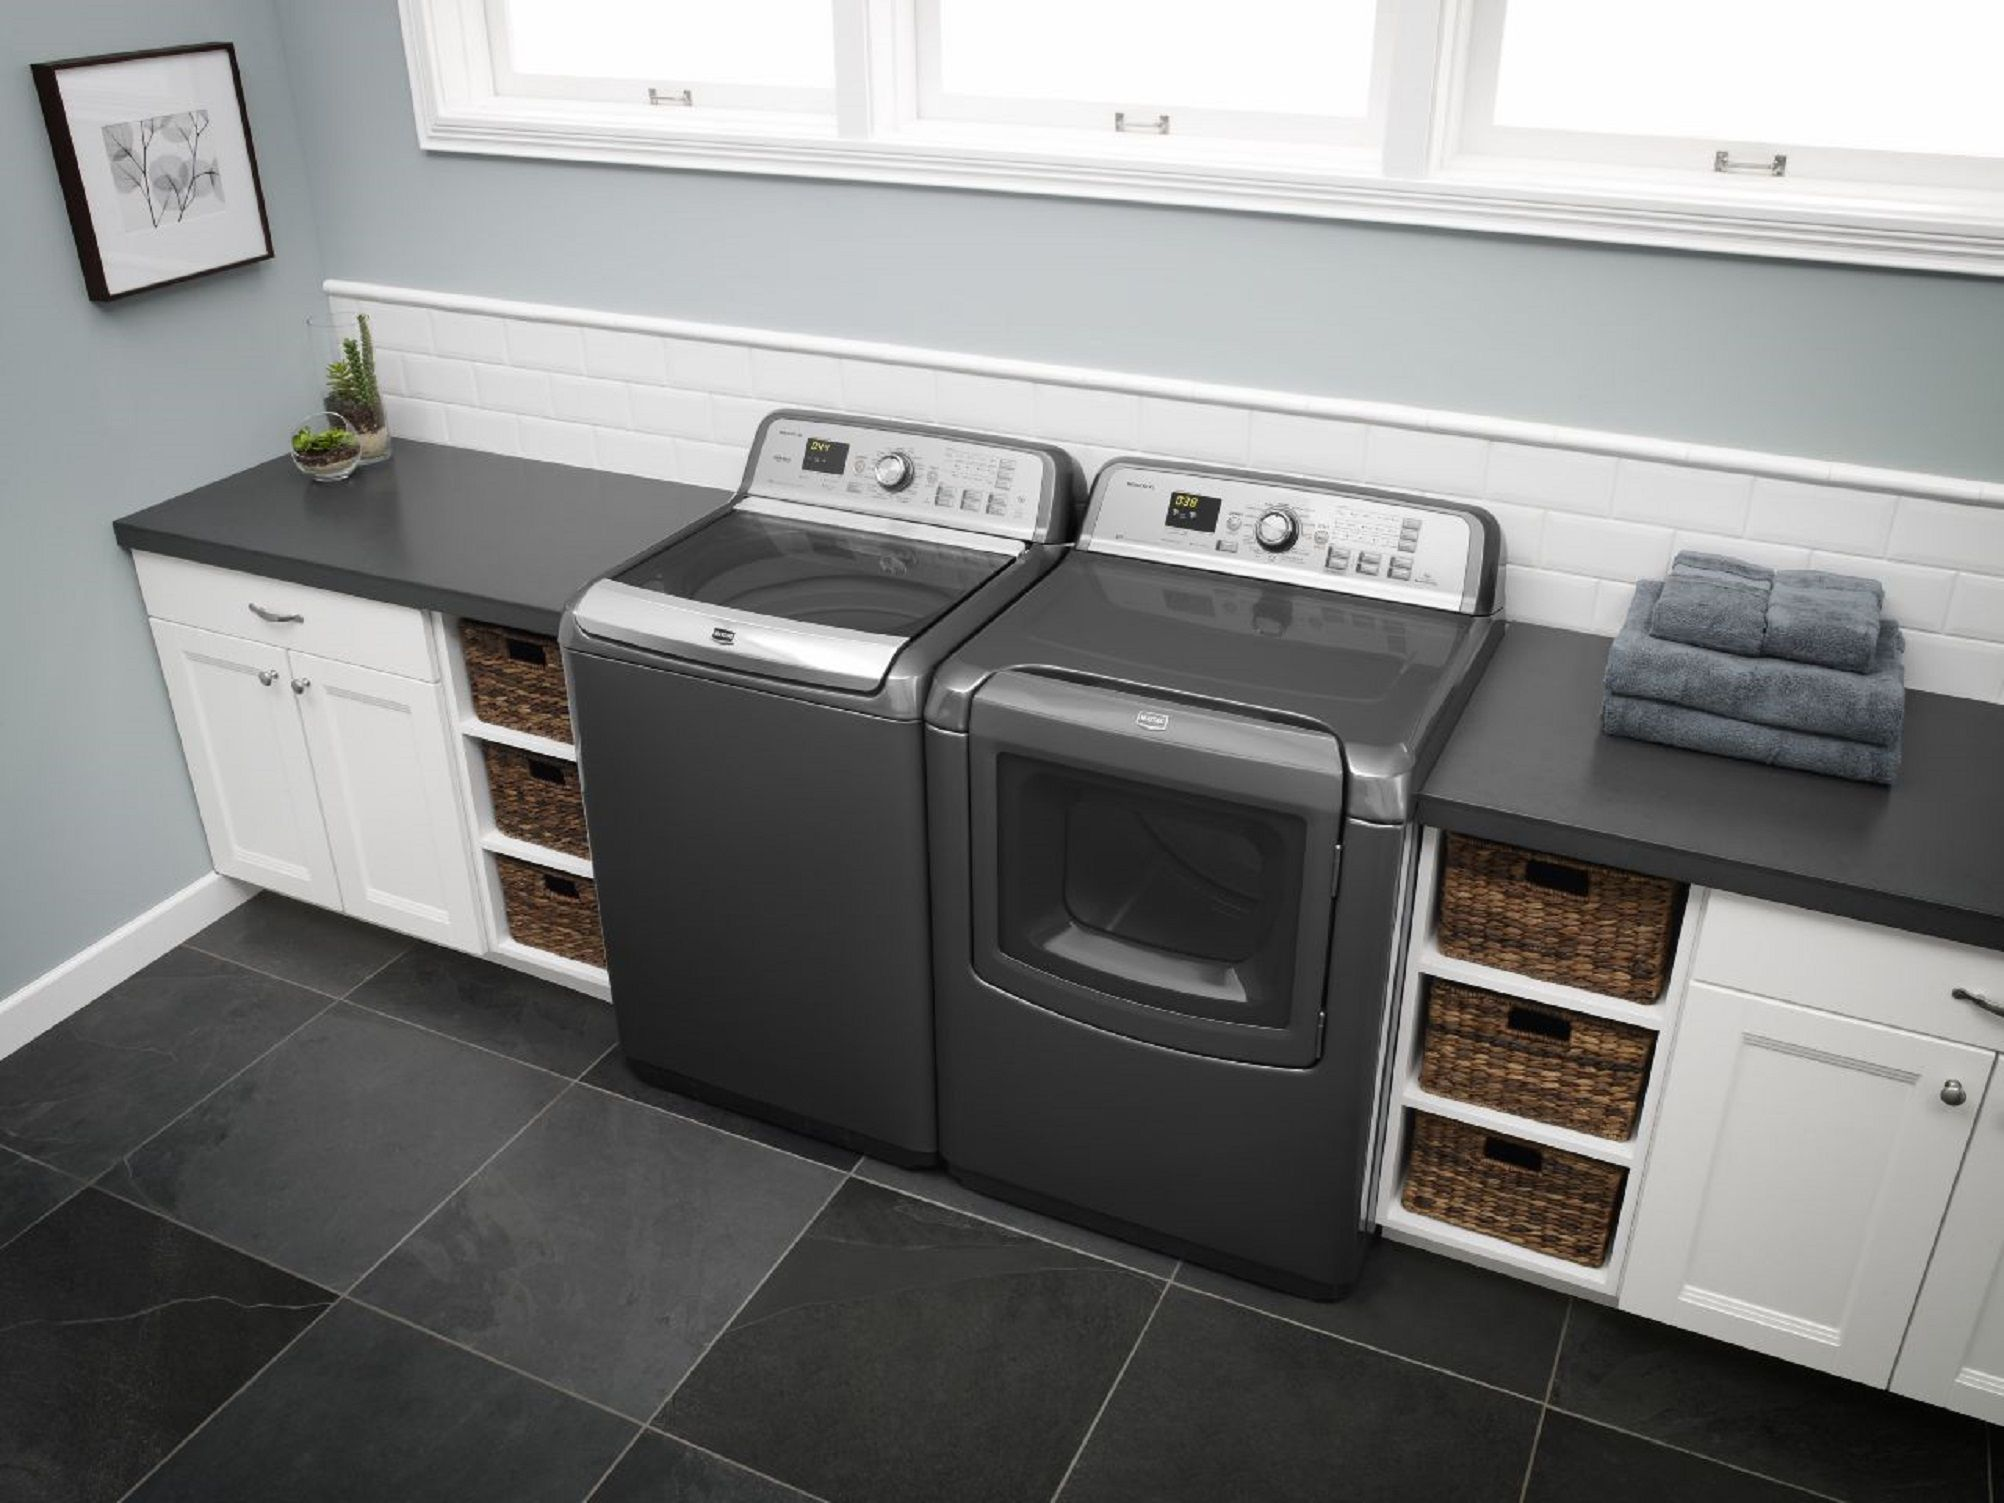 Troubleshoot Maytag Bravos Washer Problems And Repairs New Electric Dryer Motor Bundadaffacom